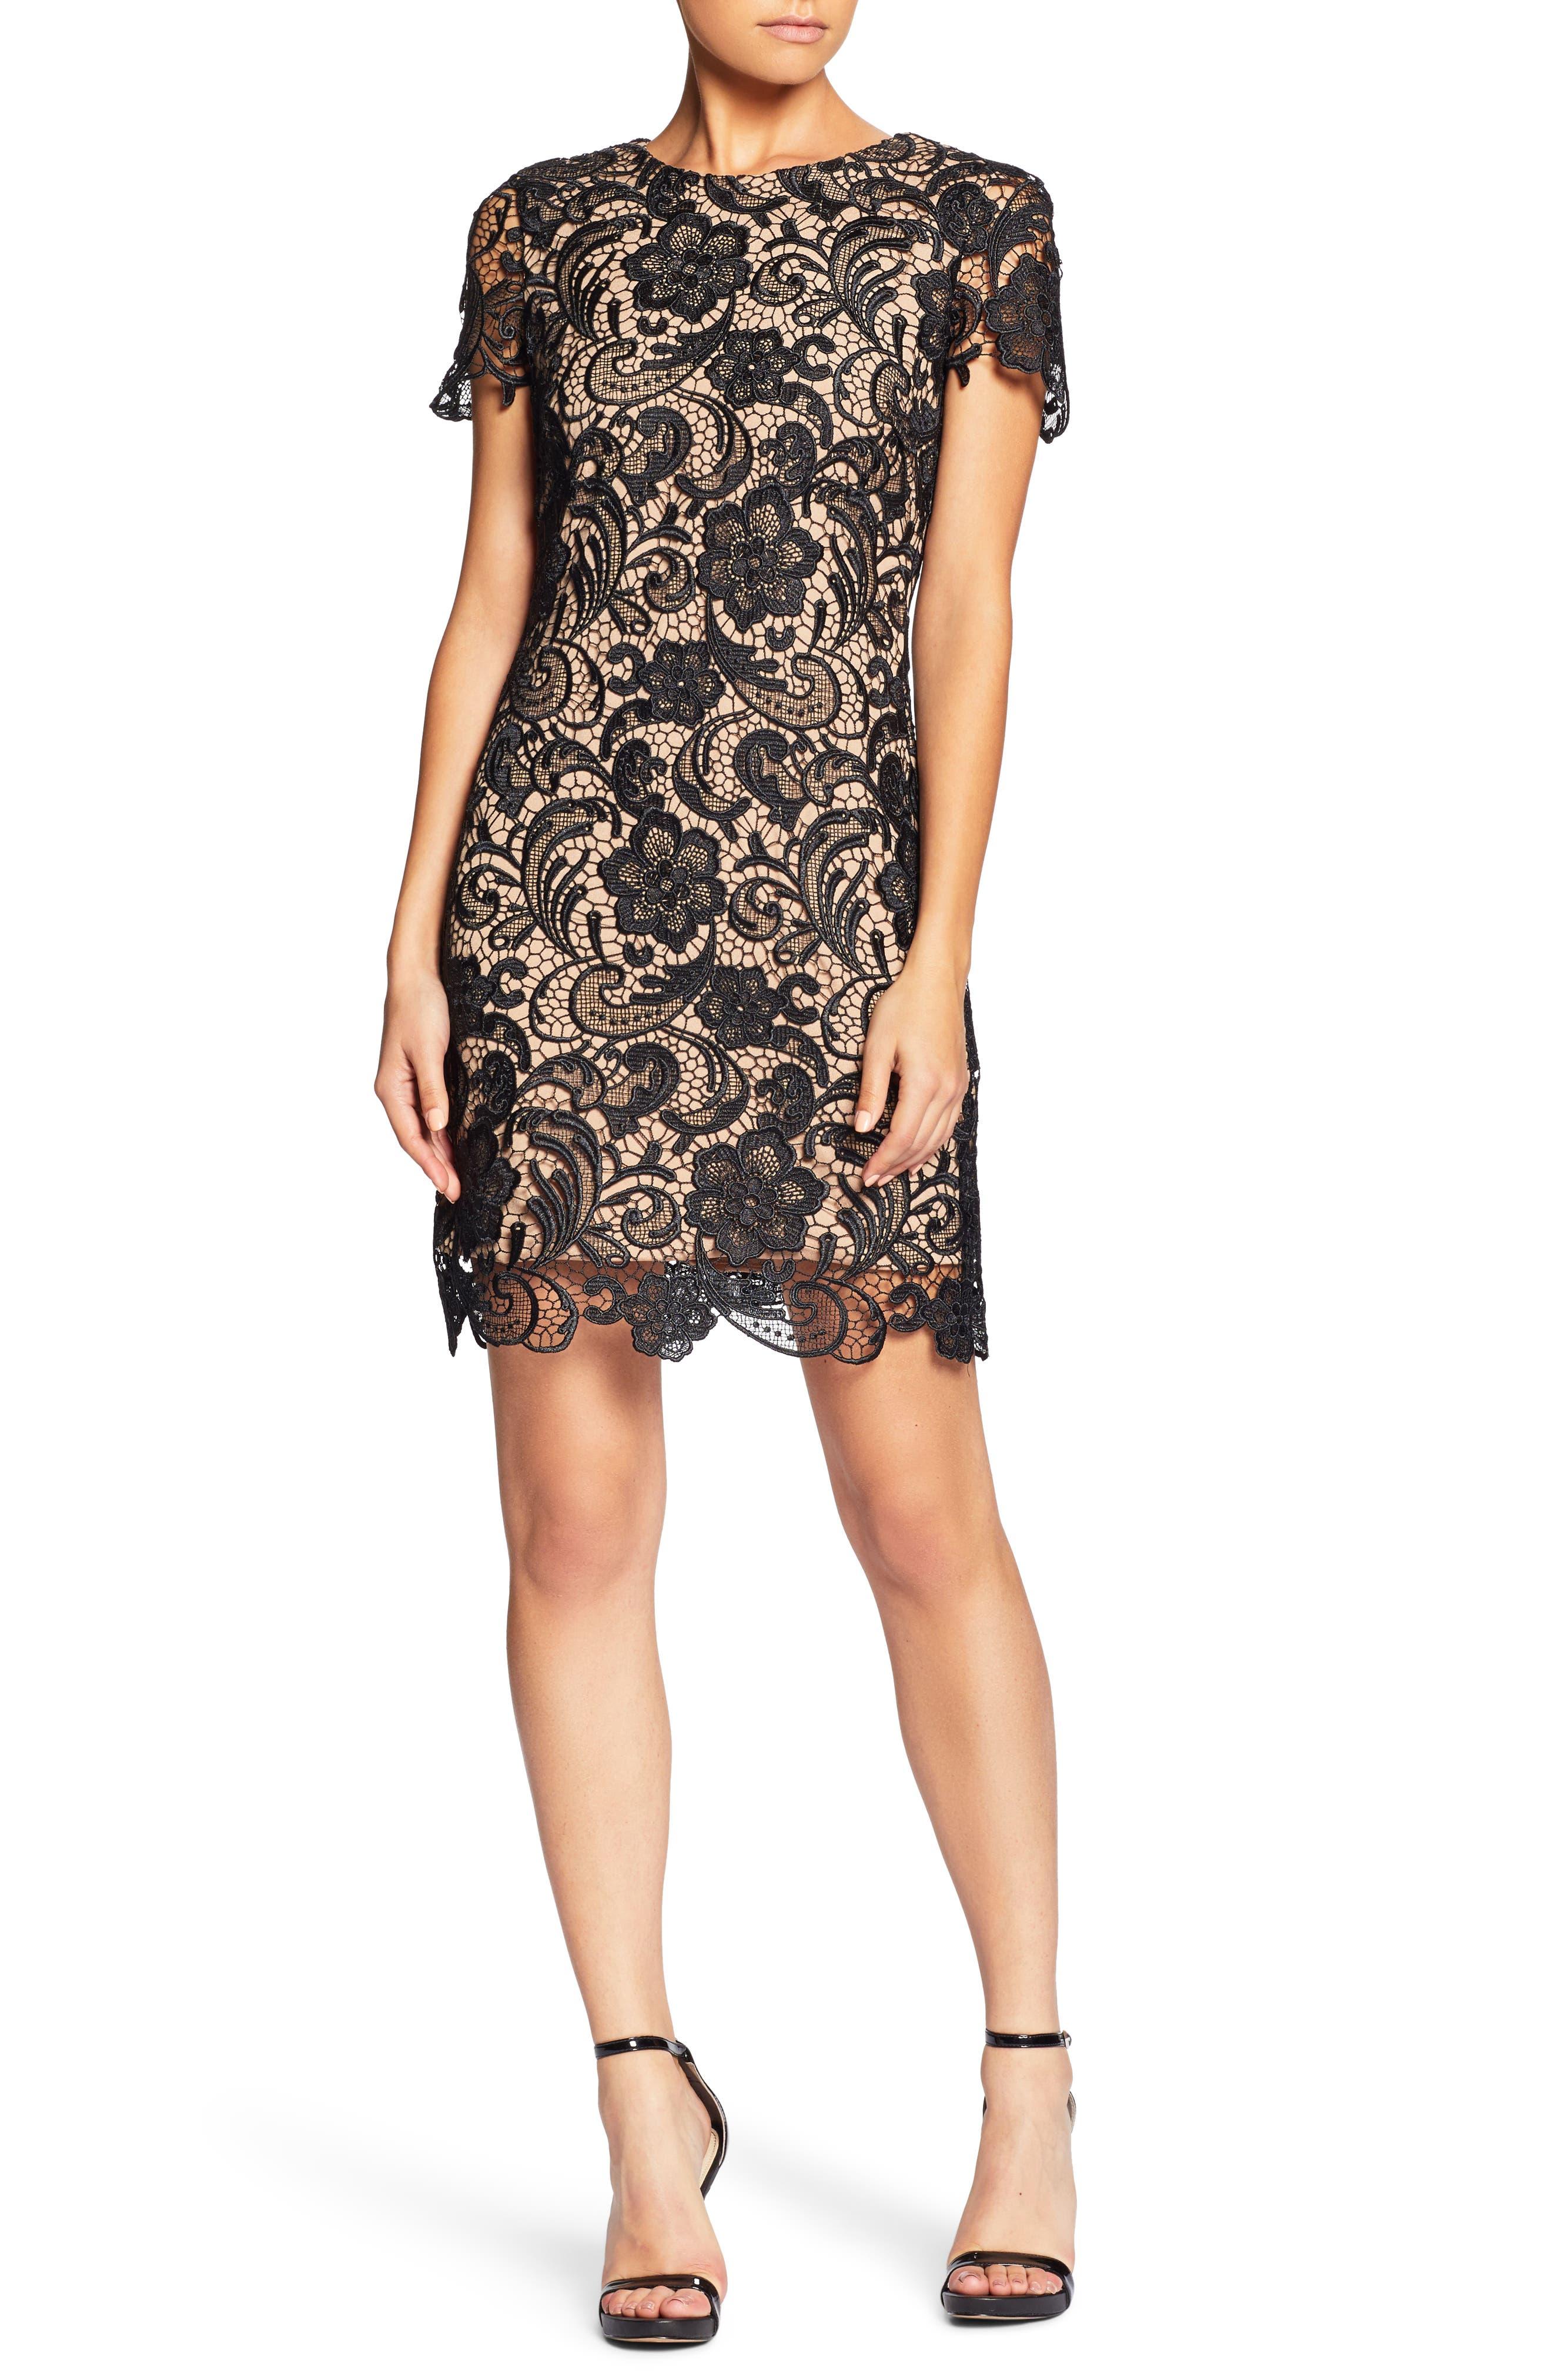 Anna Crochet Lace Sheath Dress,                             Main thumbnail 1, color,                             014